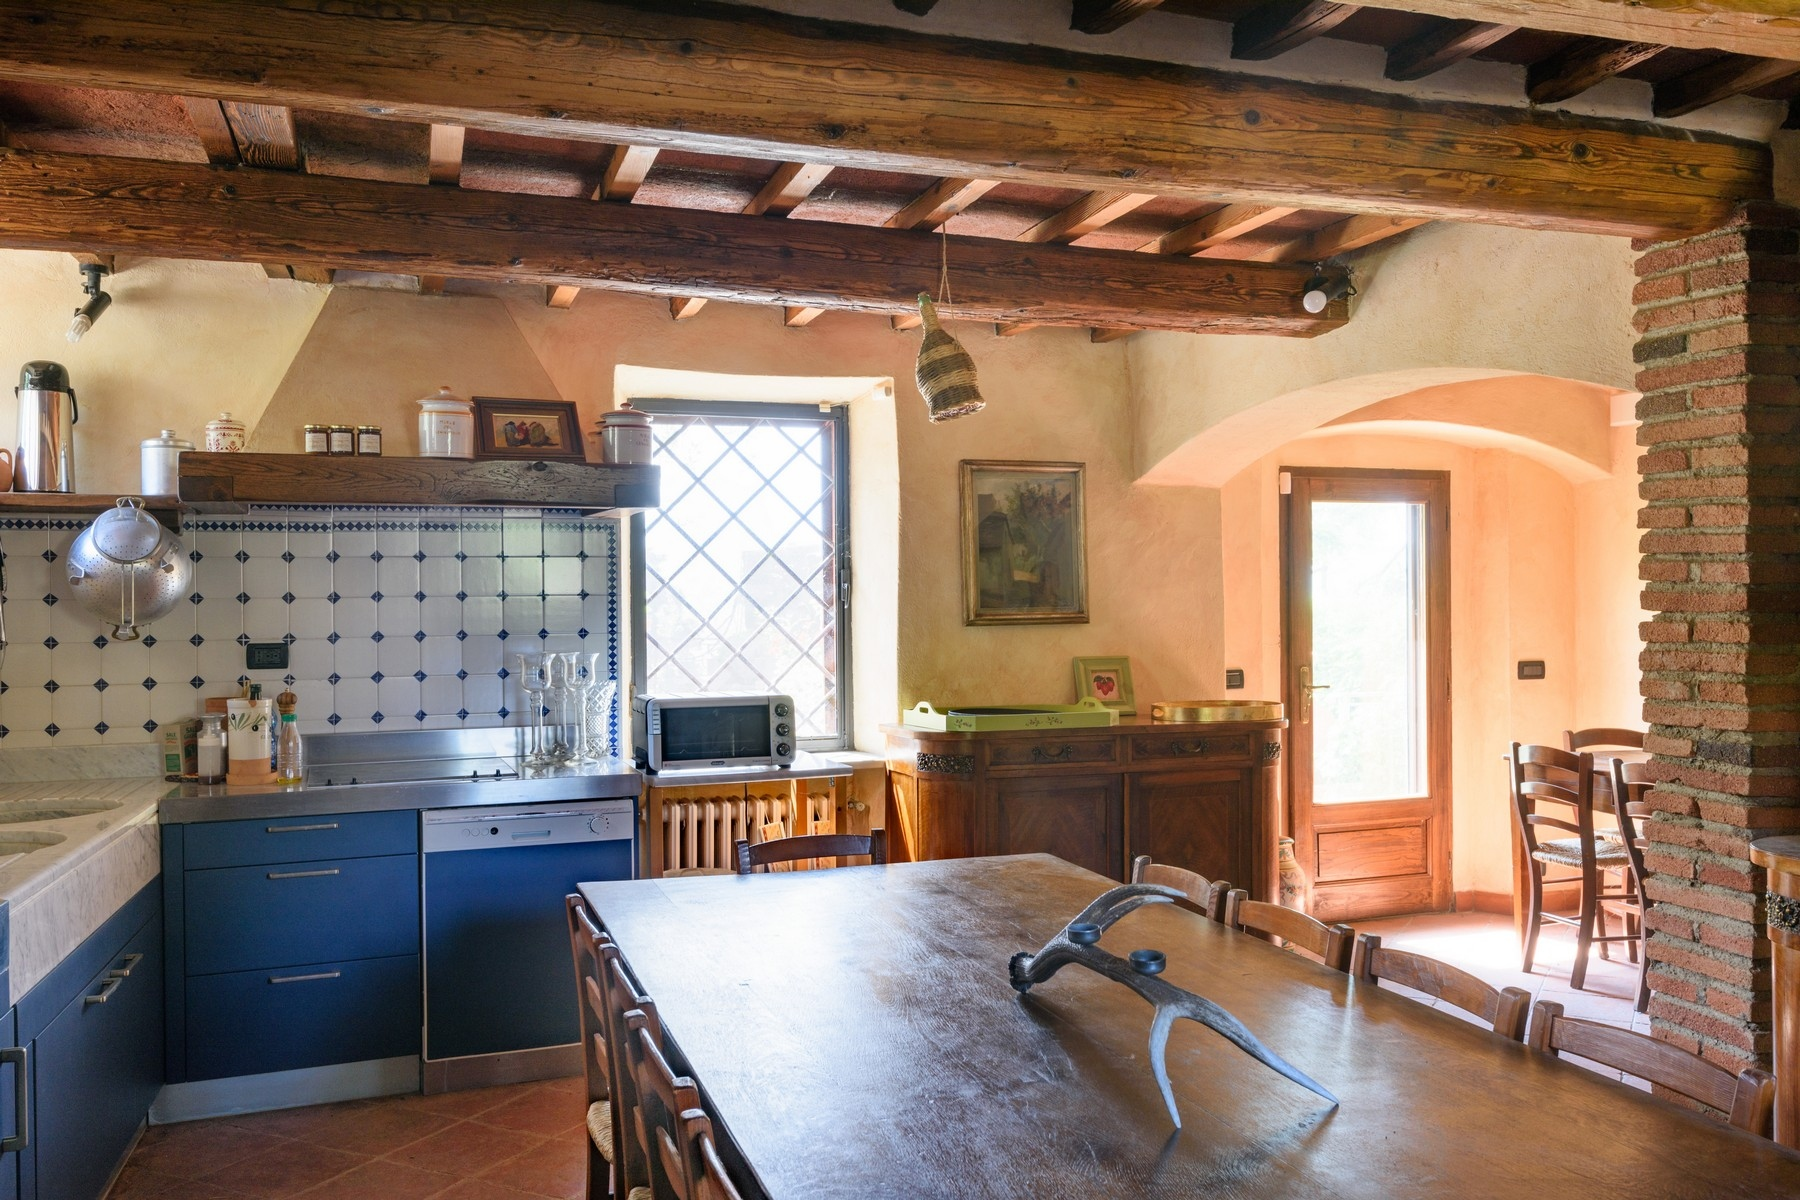 Villa in Vendita a Greve In Chianti: 5 locali, 491 mq - Foto 7